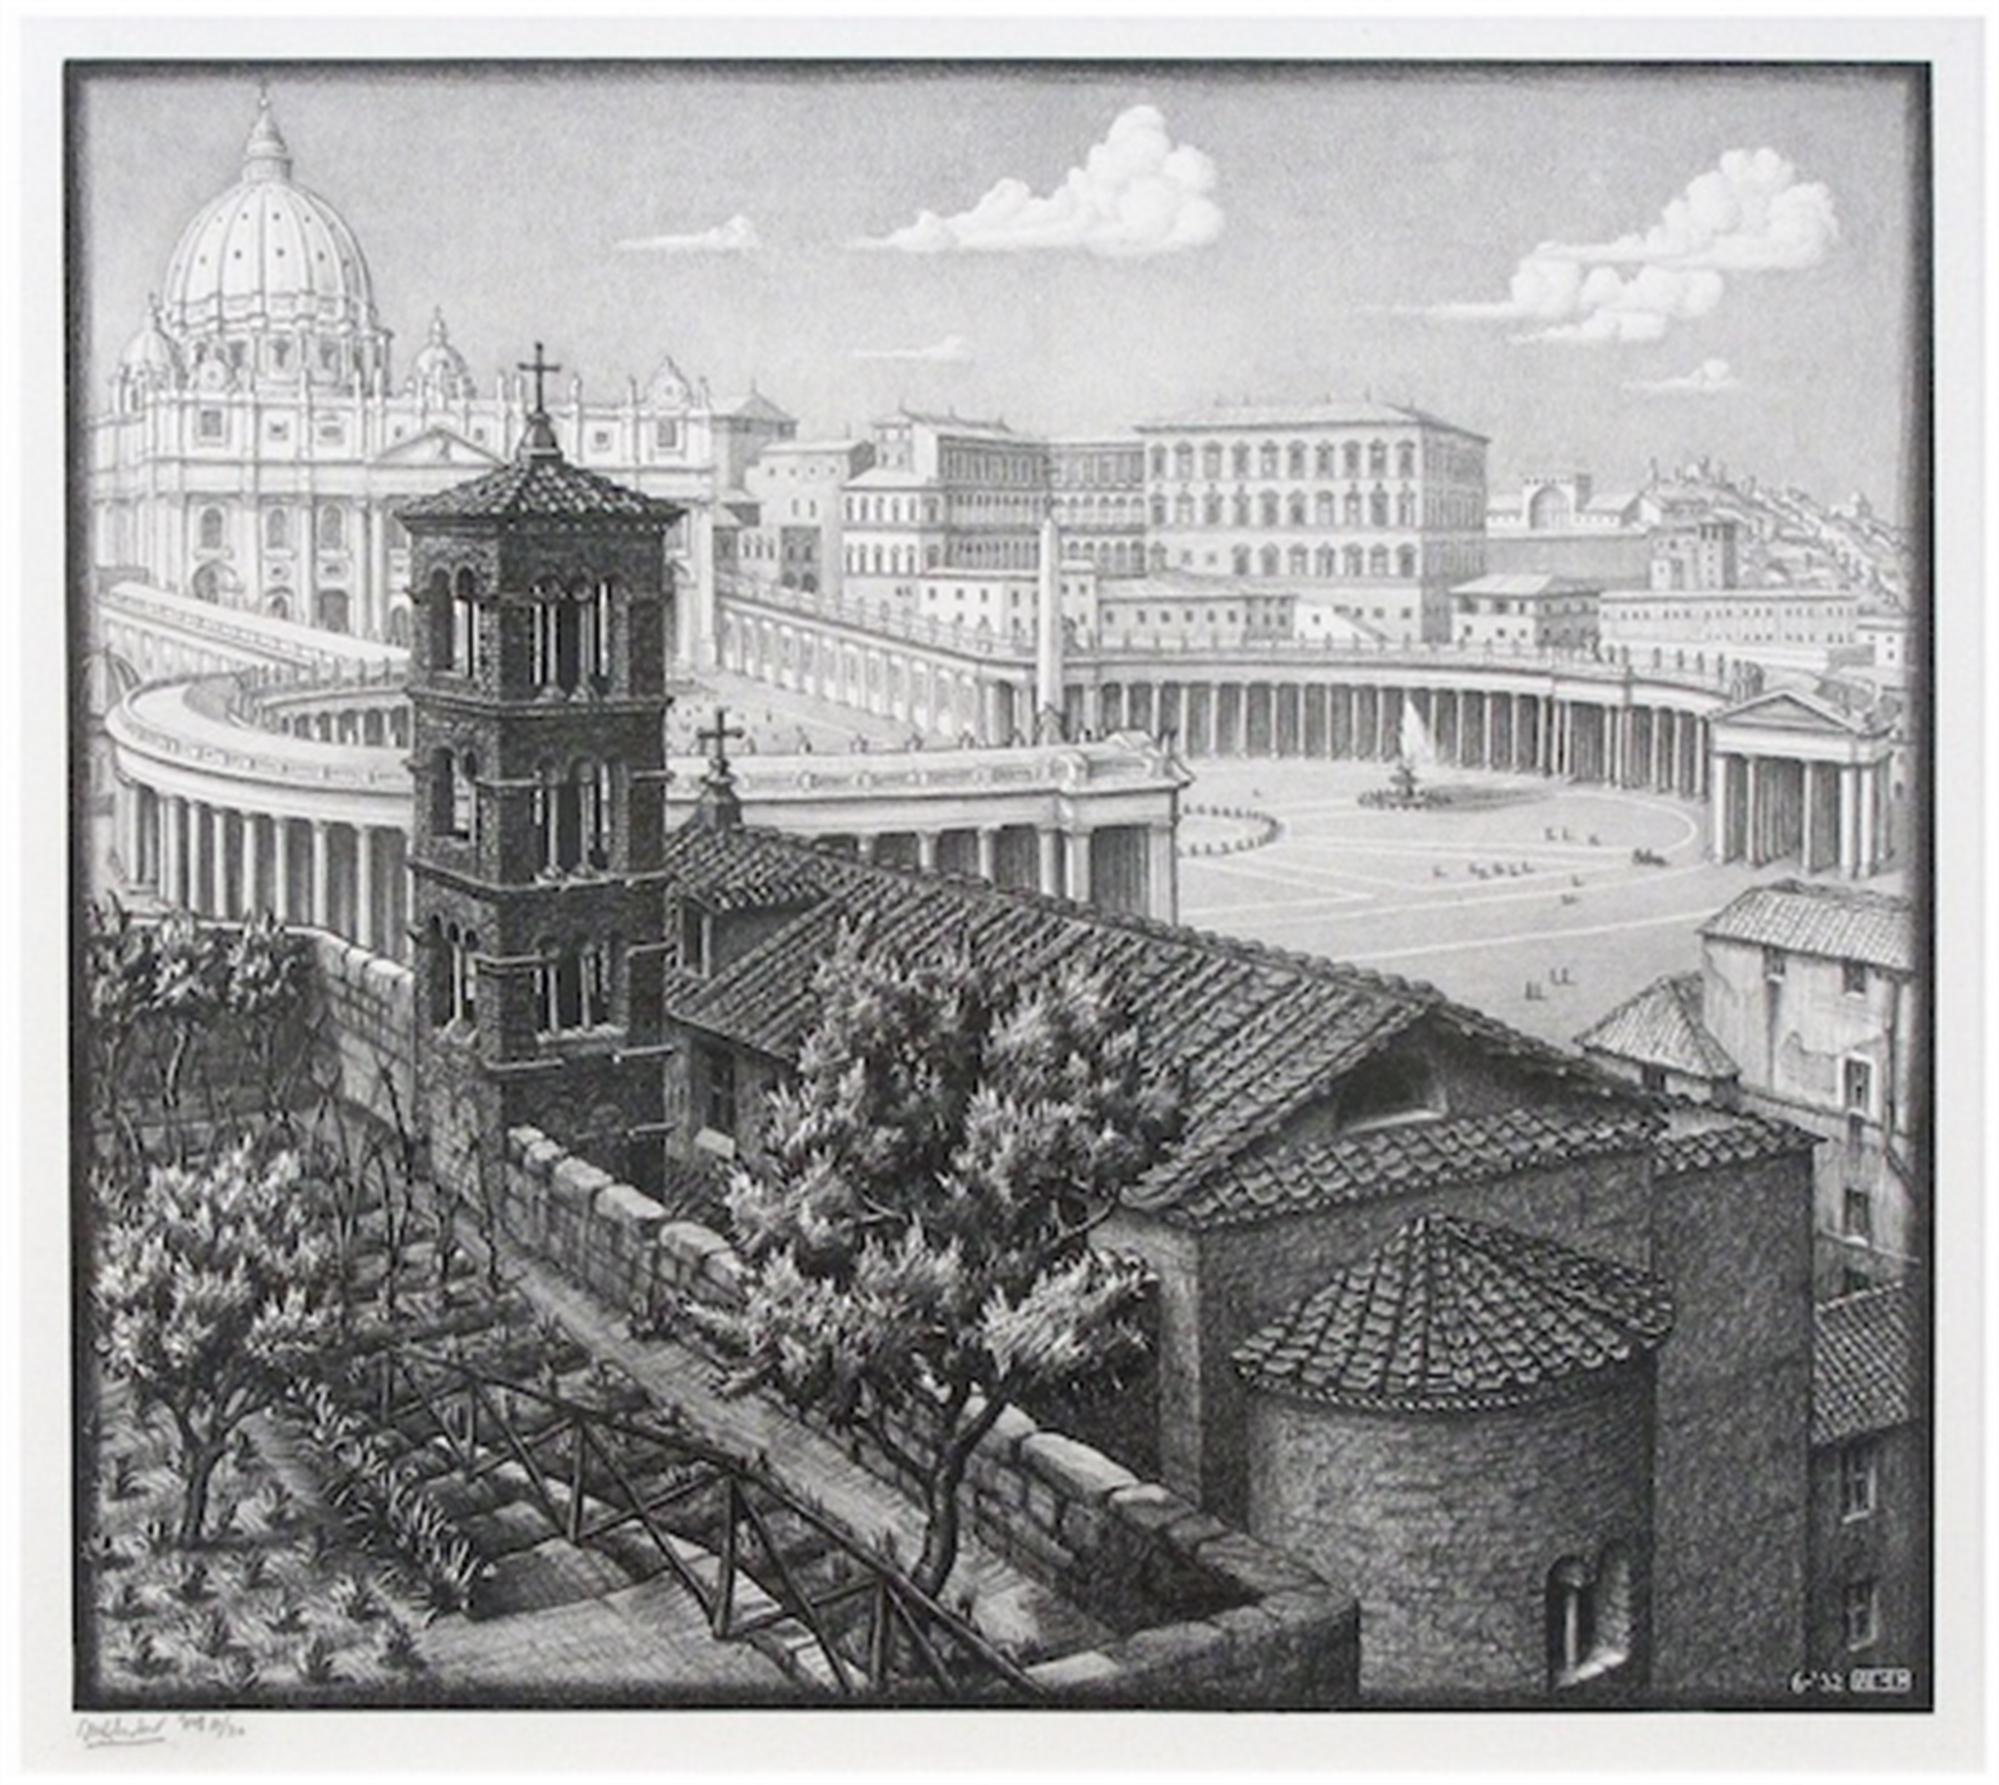 San Michele Rome by M.C. Escher